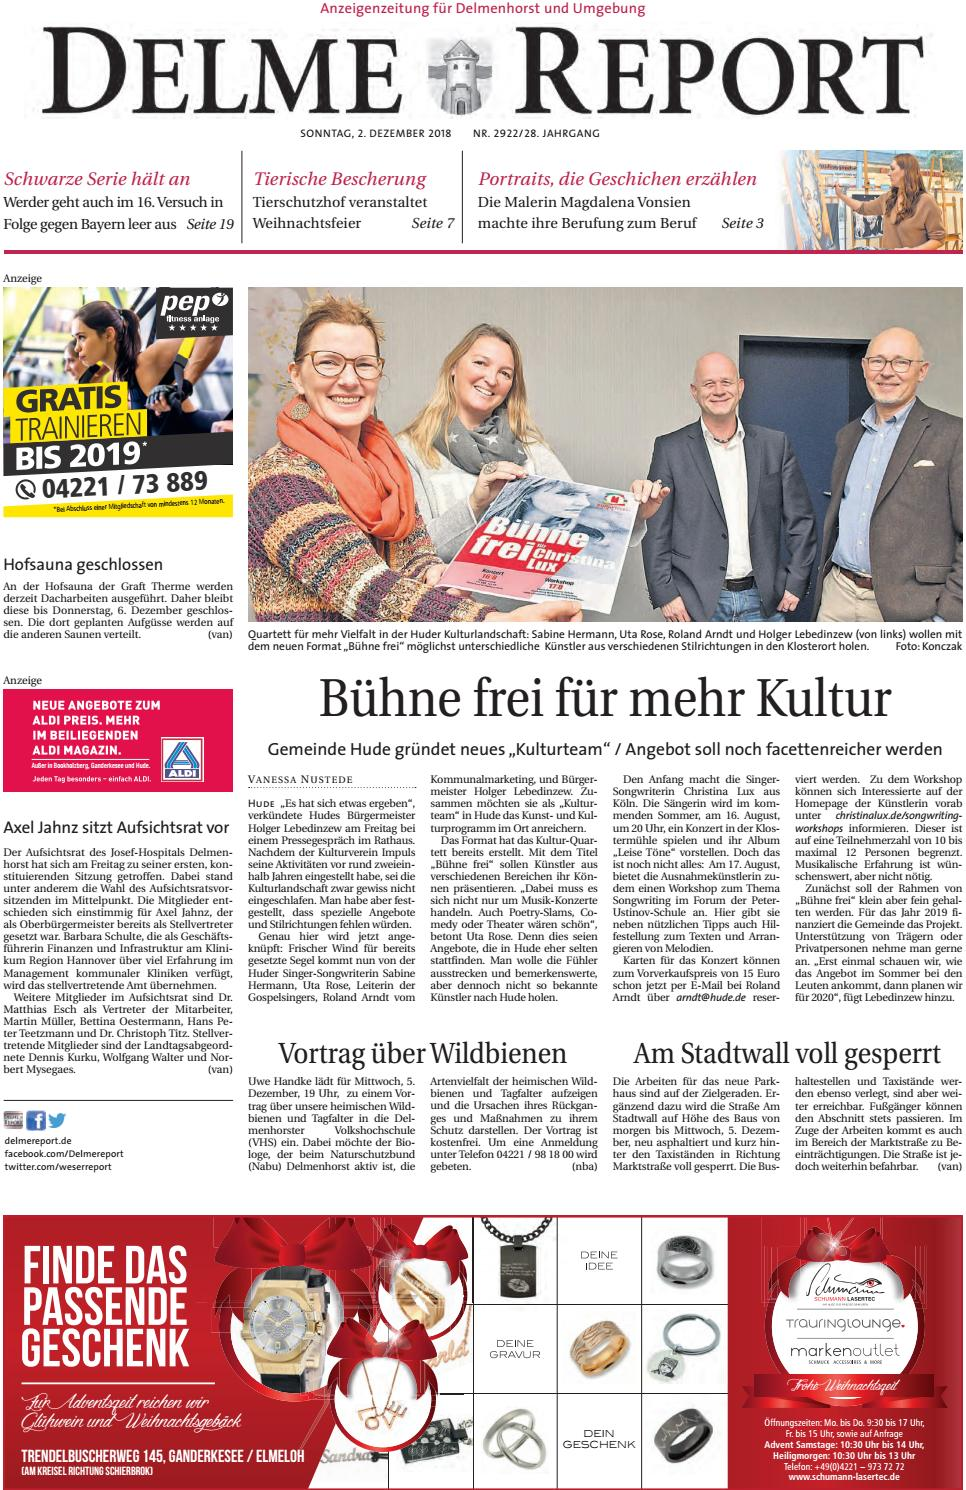 Delme Report vom 02.12.2018 by KPS Verlagsgesellschaft mbH - issuu